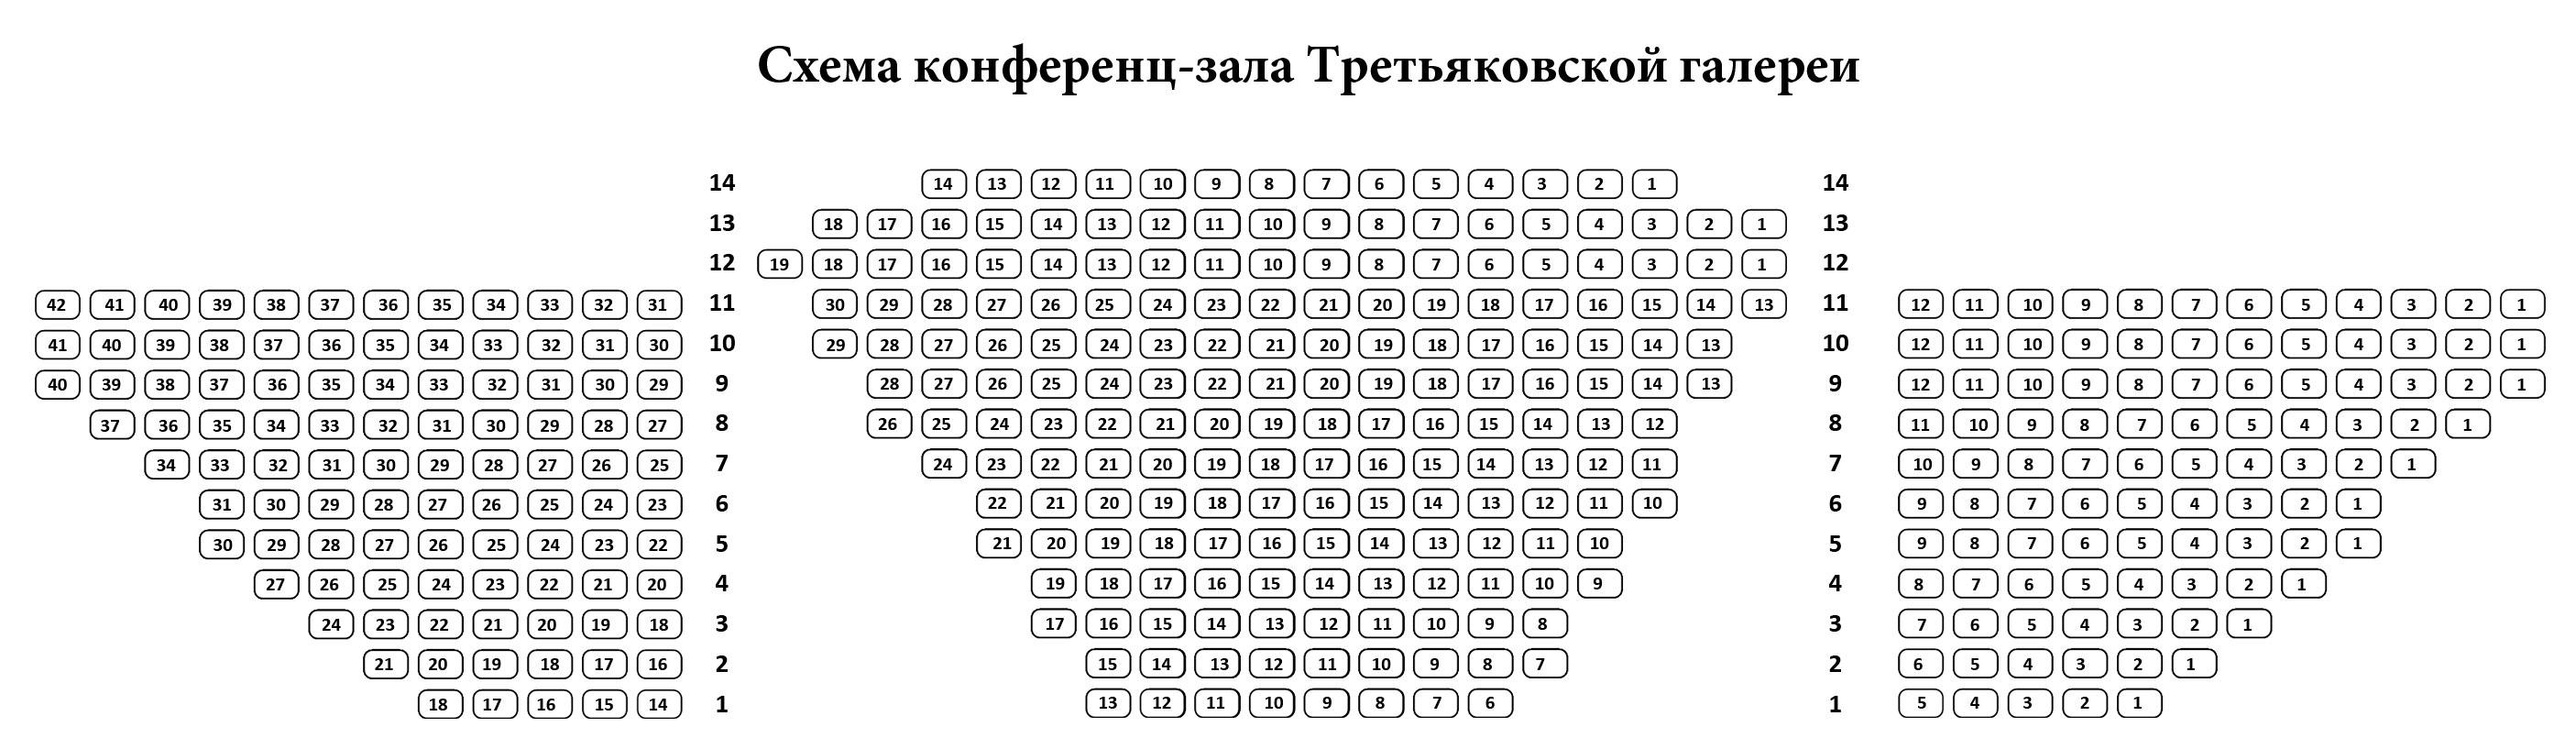 Схема зала Третьяковская галерея (Конференц-зал)